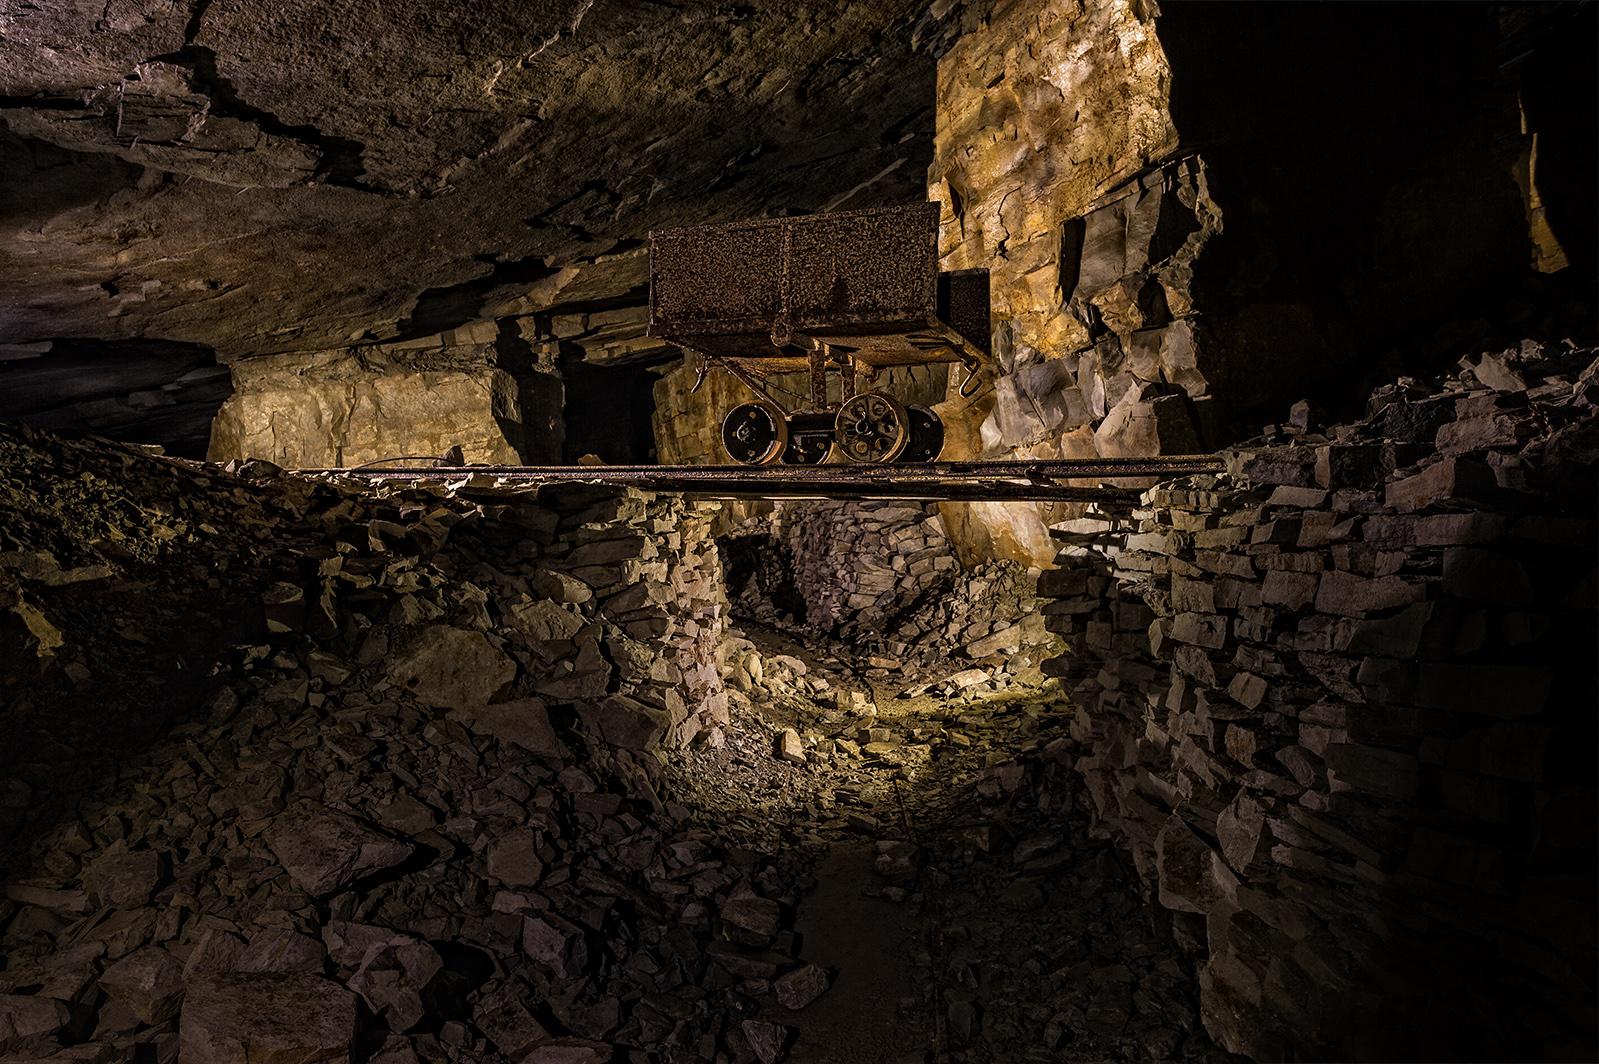 Indiana Jones Quarry, Lore